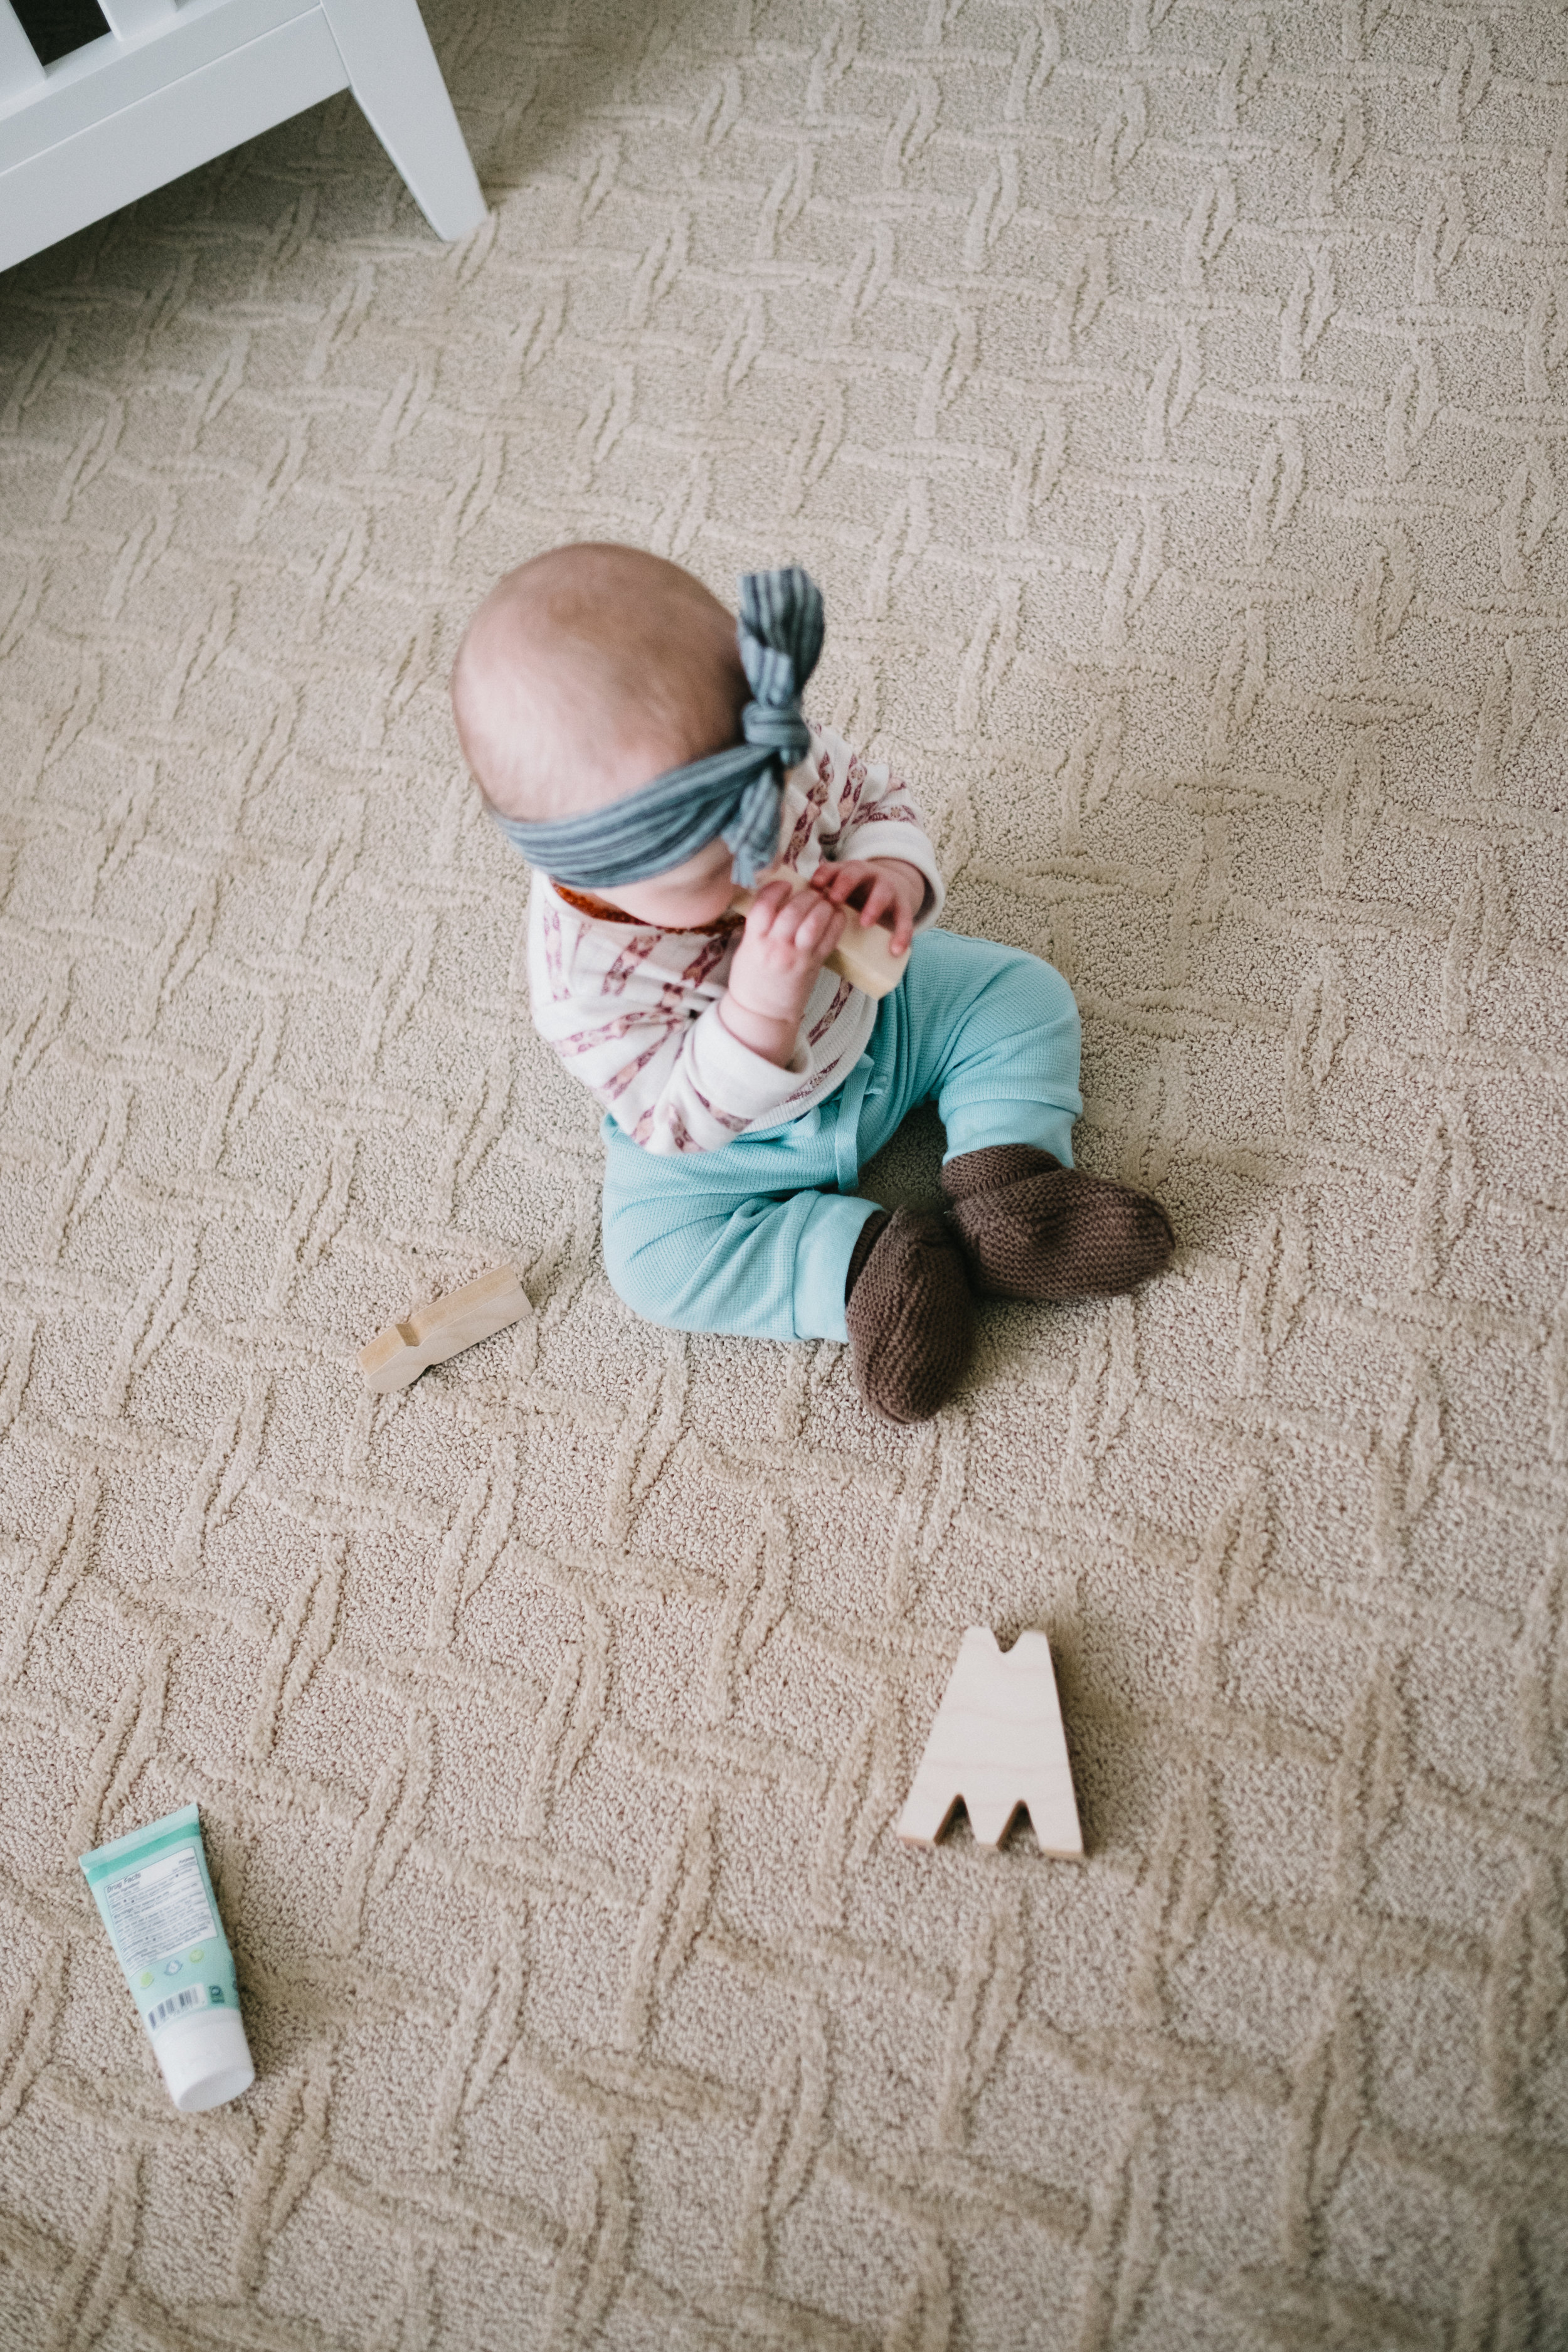 Baby on floor with blocks